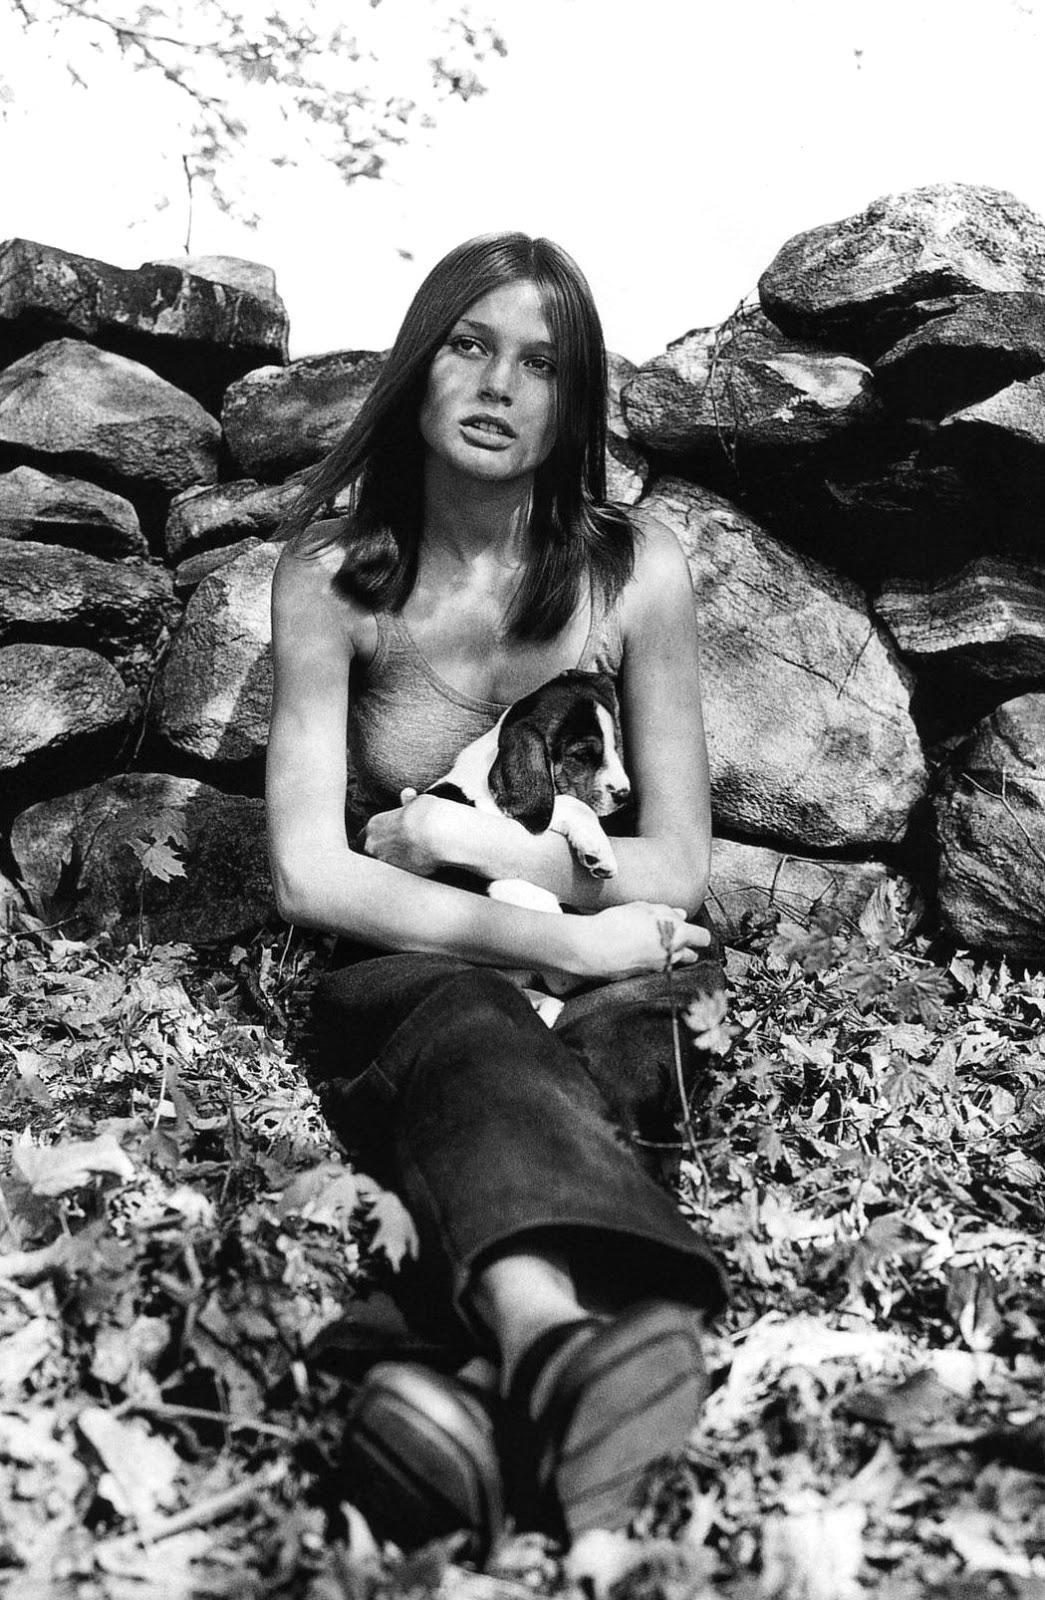 Bridget Hall in Harper's Bazaar July 1998 (photography: Mikael Jansson, styling: Elissa Santisi) via fashioned by love british fashion blog